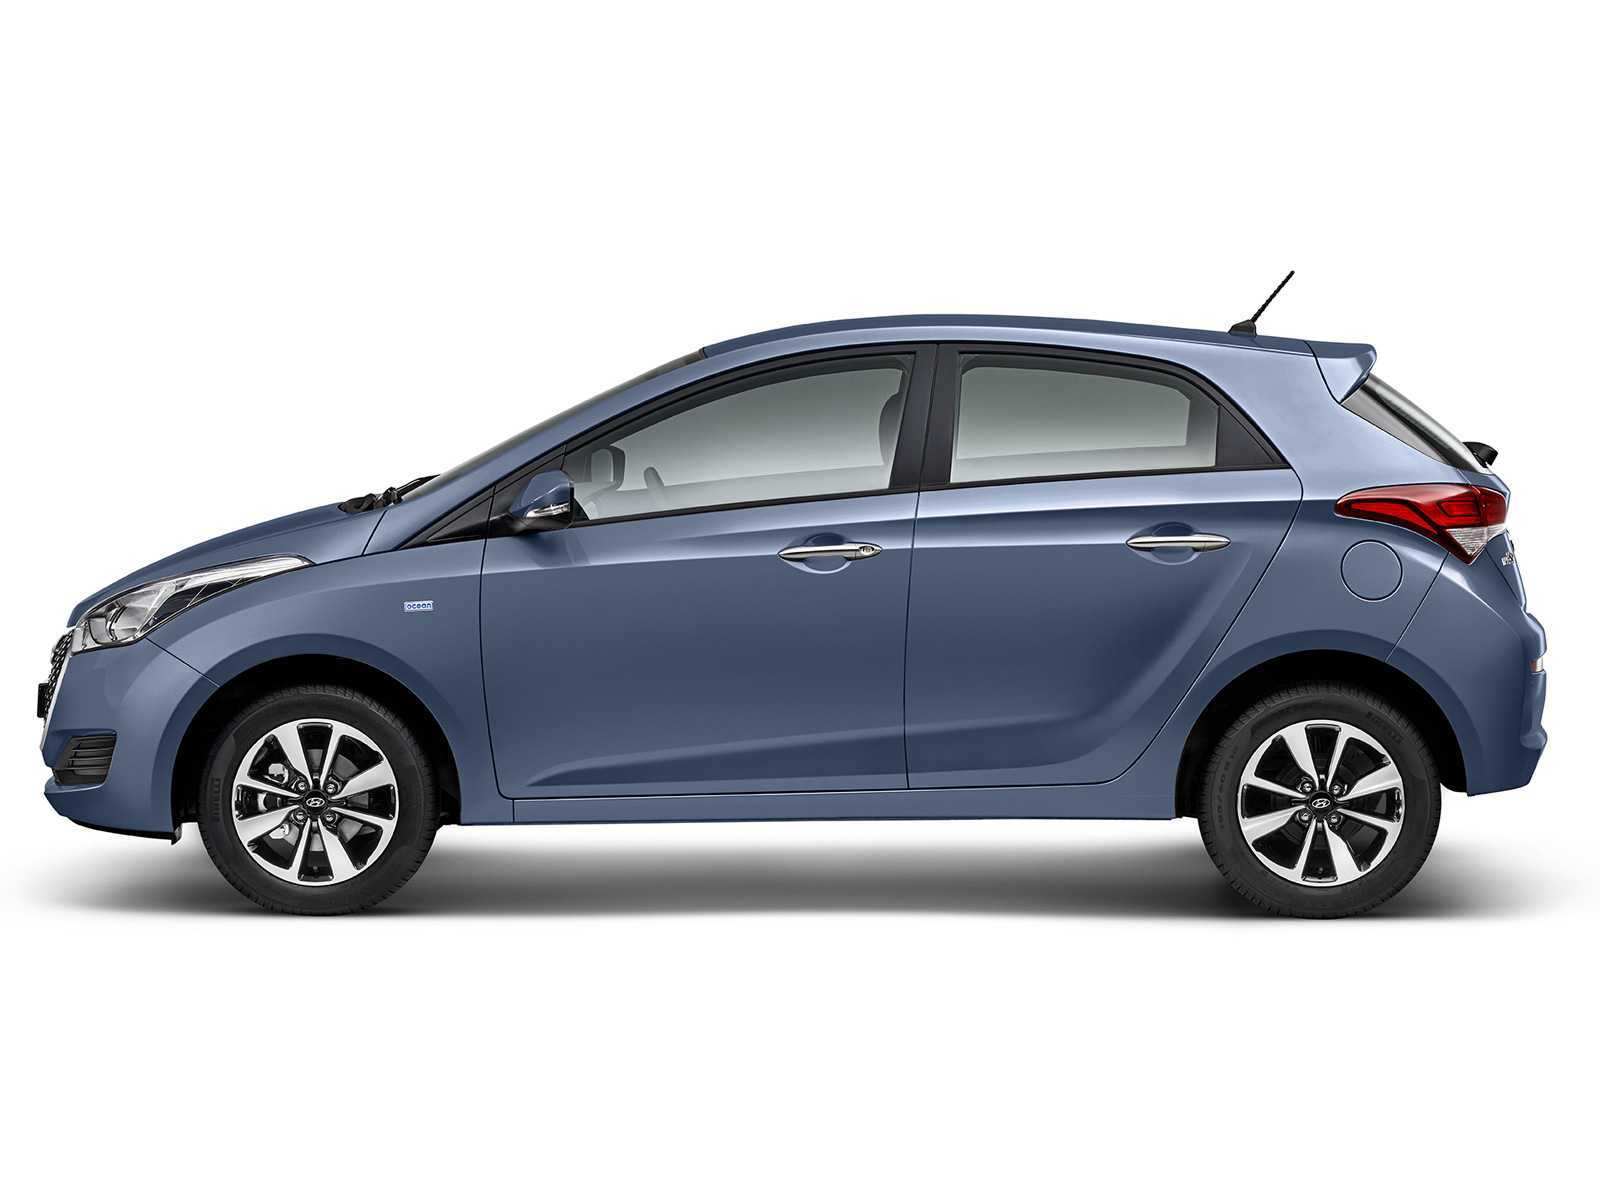 HyundaiHB20 2017 - lateral